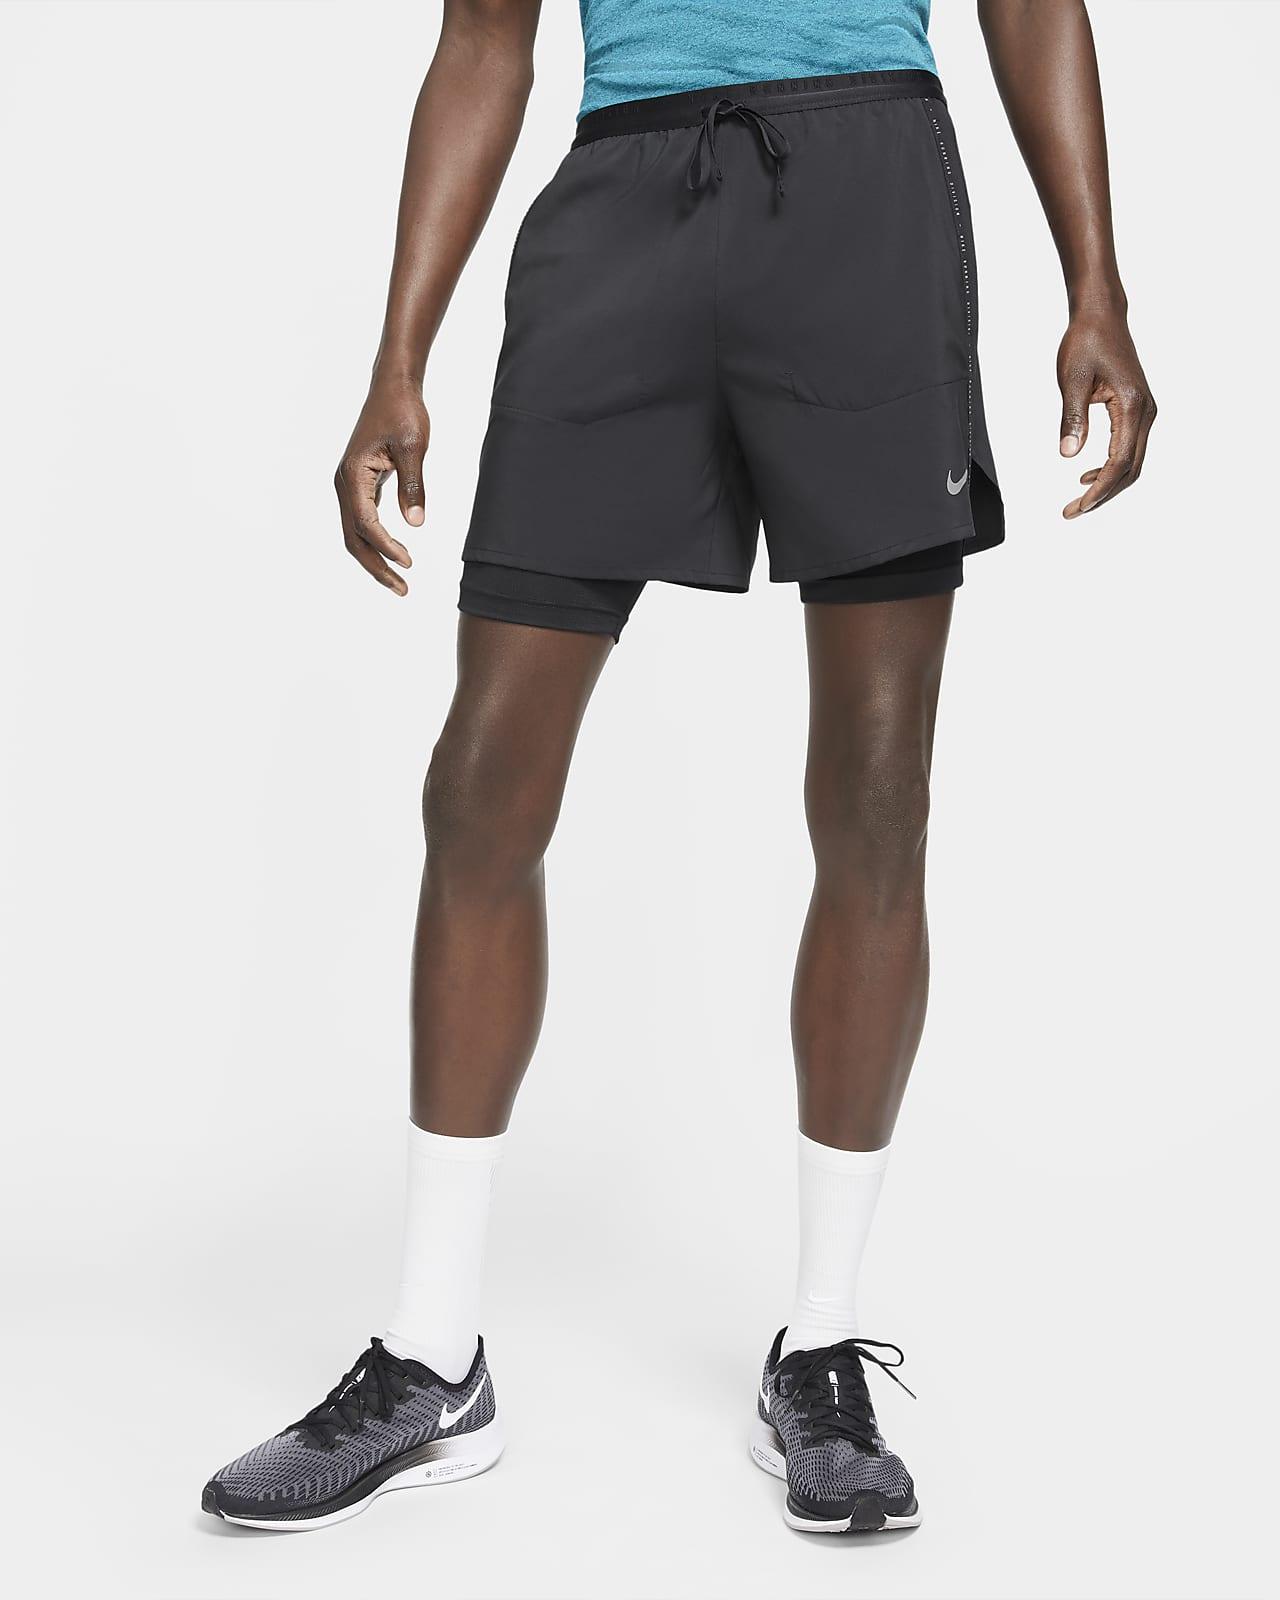 Nike Flex Stride Run Division Men's Hybrid Running Shorts